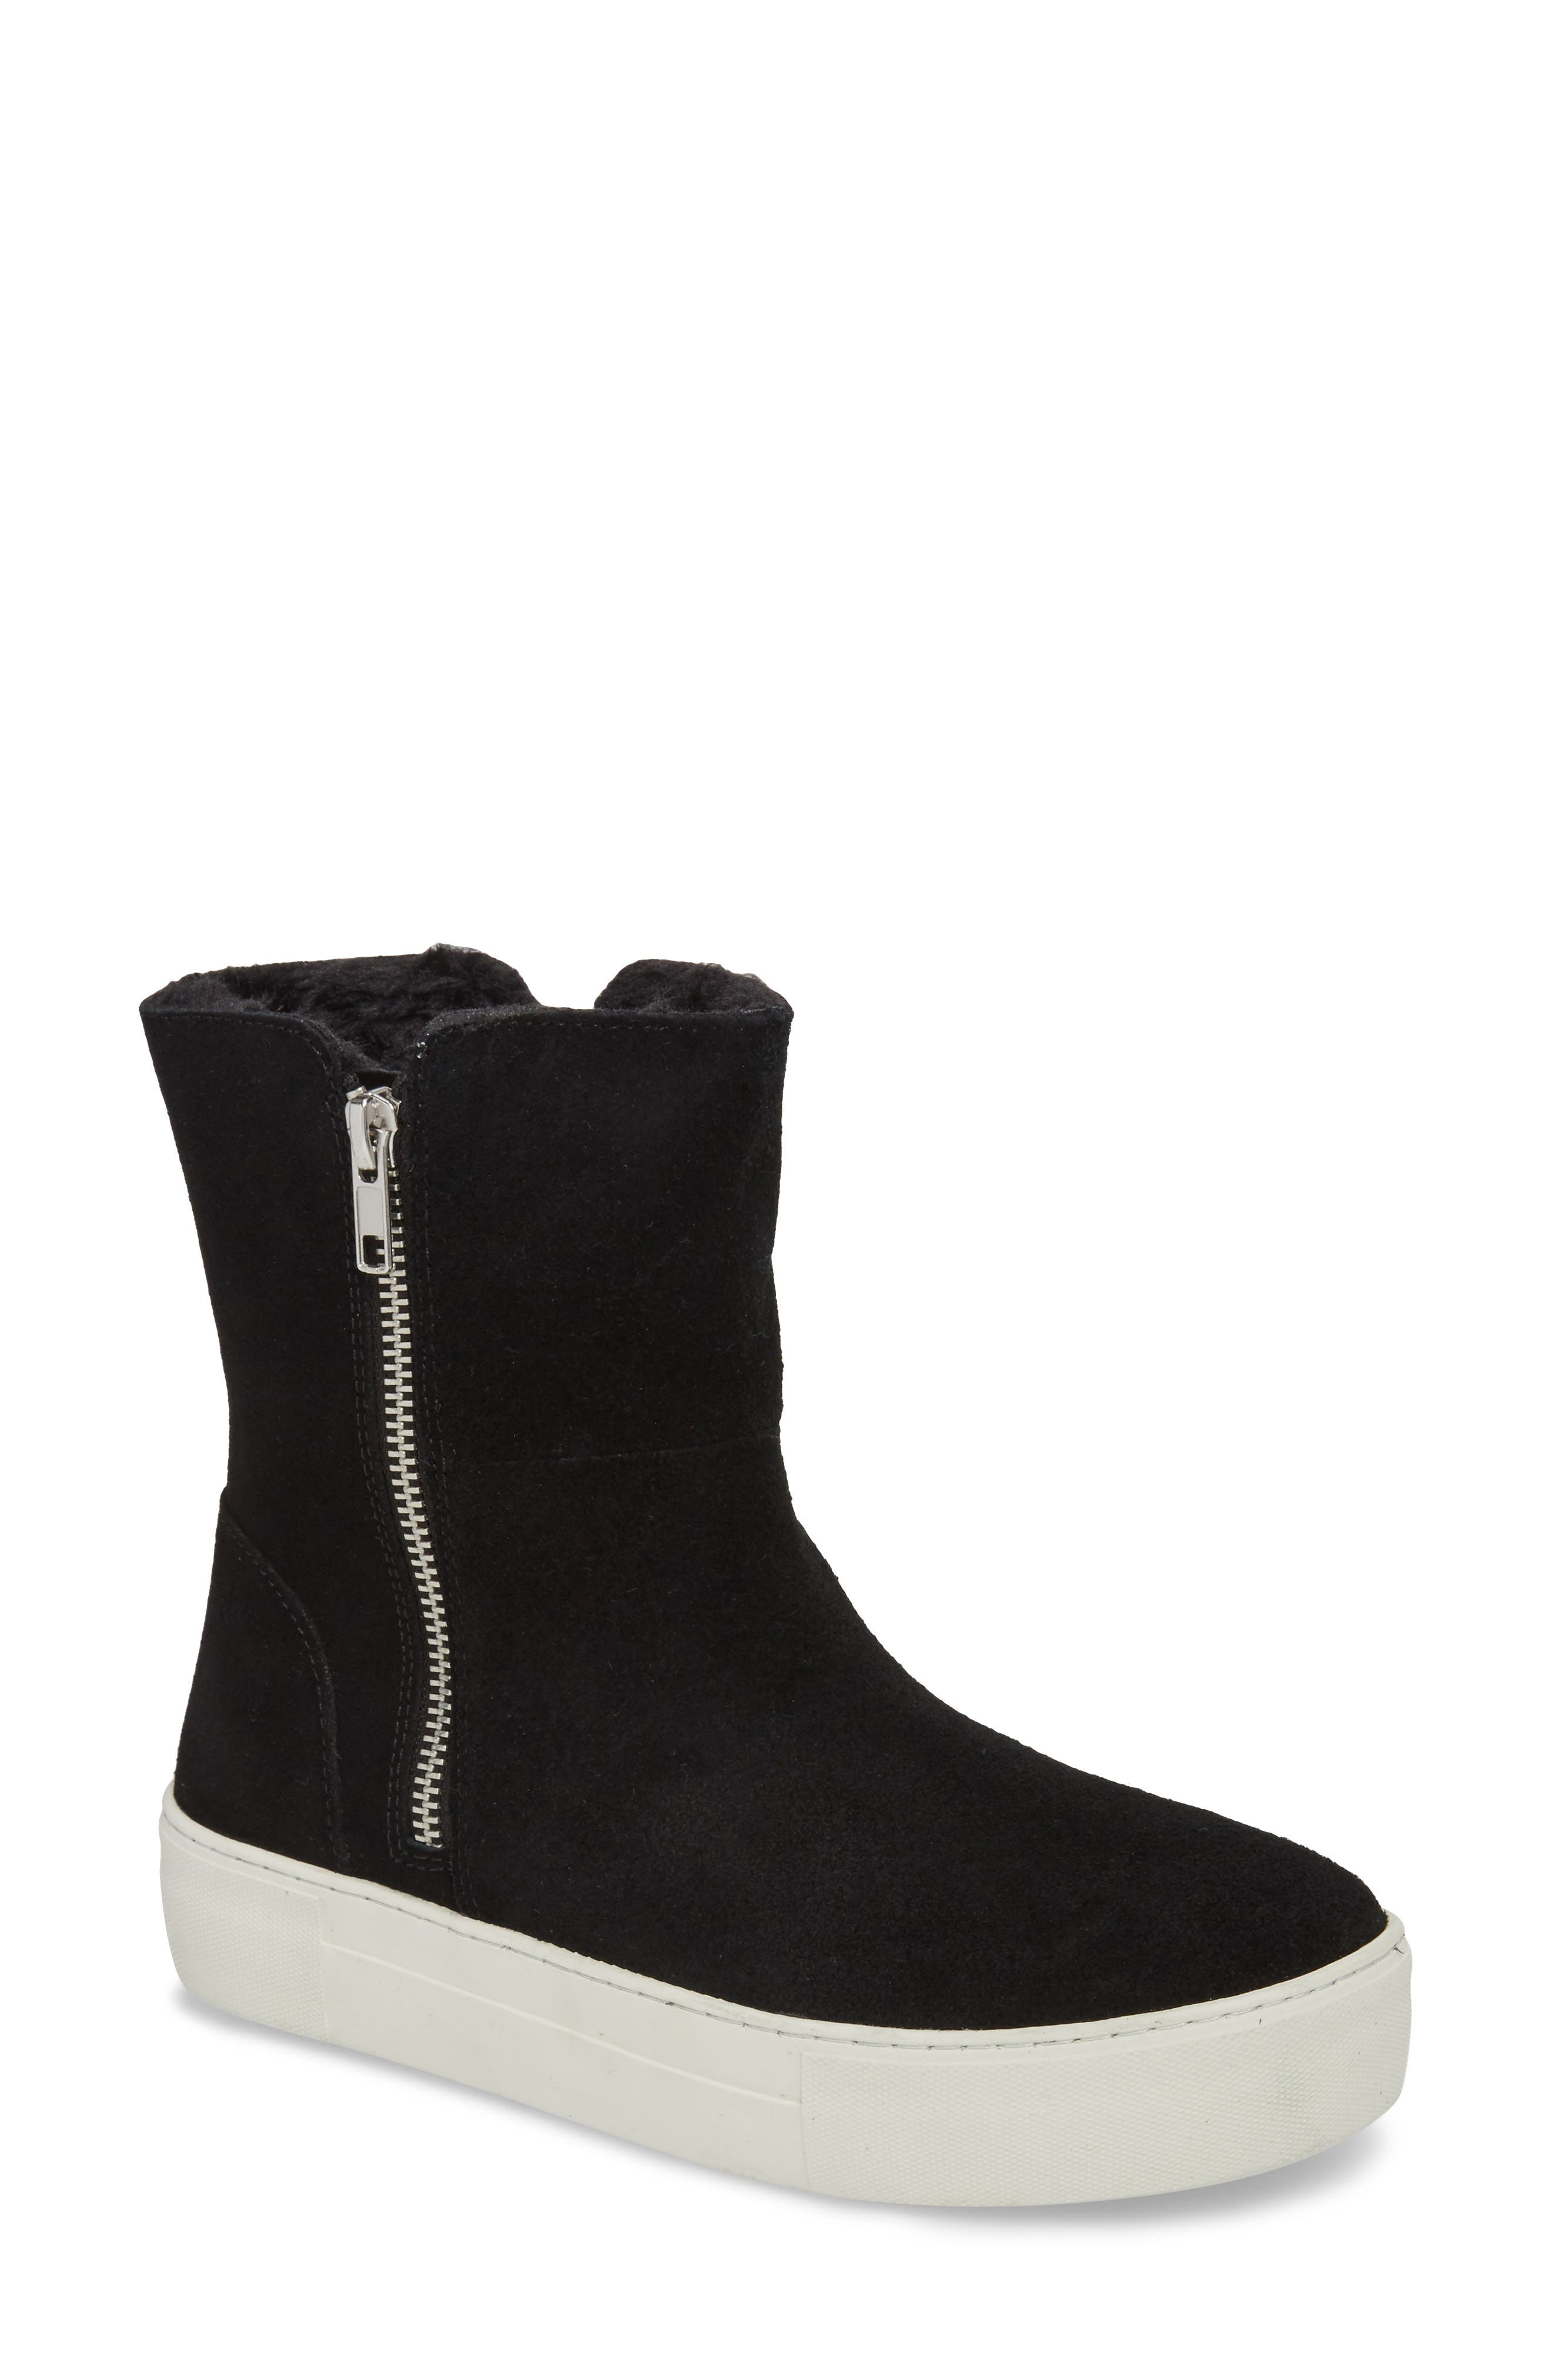 Garrson Sneaker Boot,                             Main thumbnail 1, color,                             006